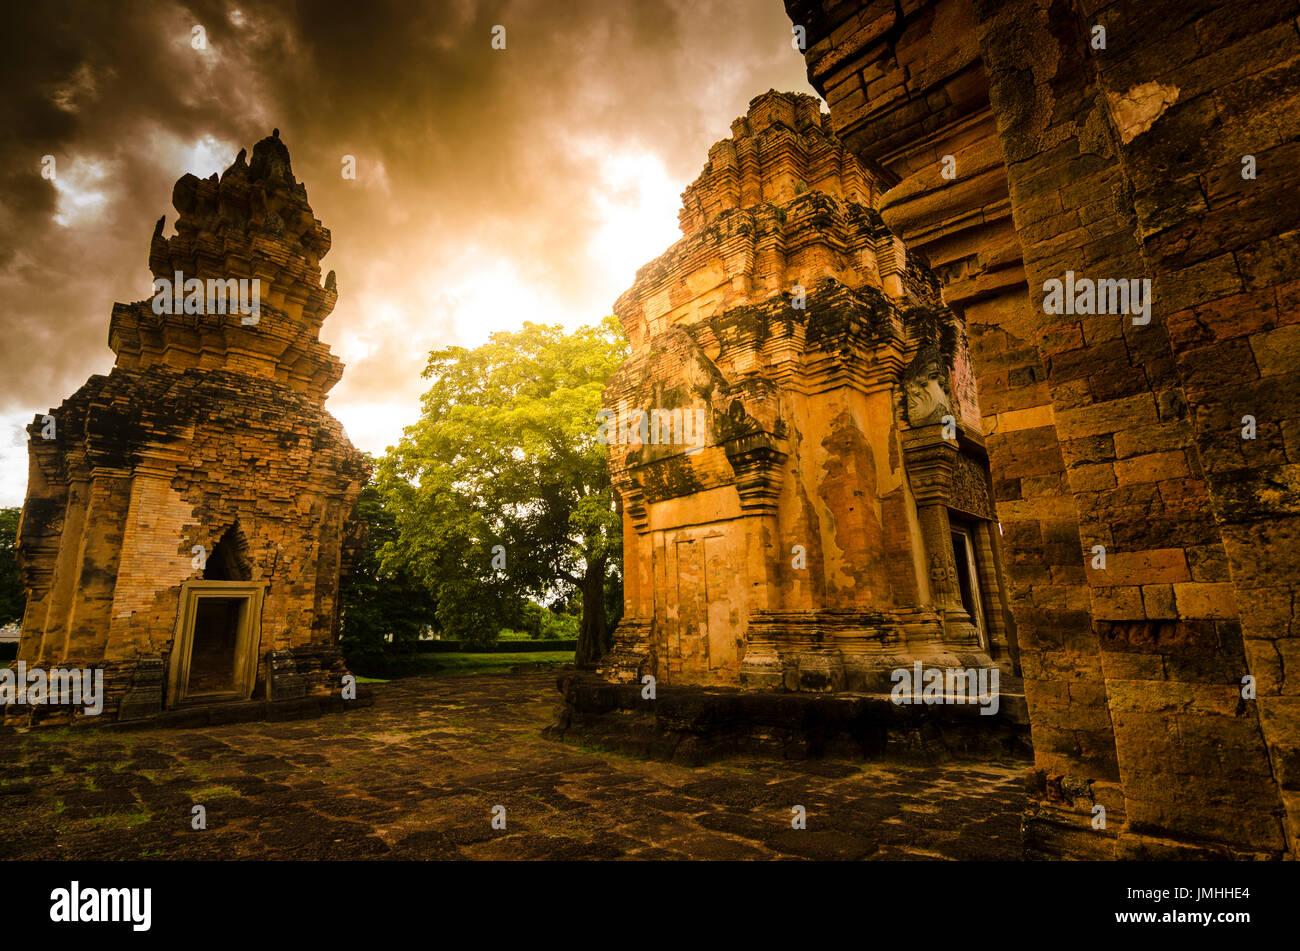 Prasat Si Khoraphum , Buddhist sculpture,Cambodia architecture ,Surin ,Thailand. - Stock Image